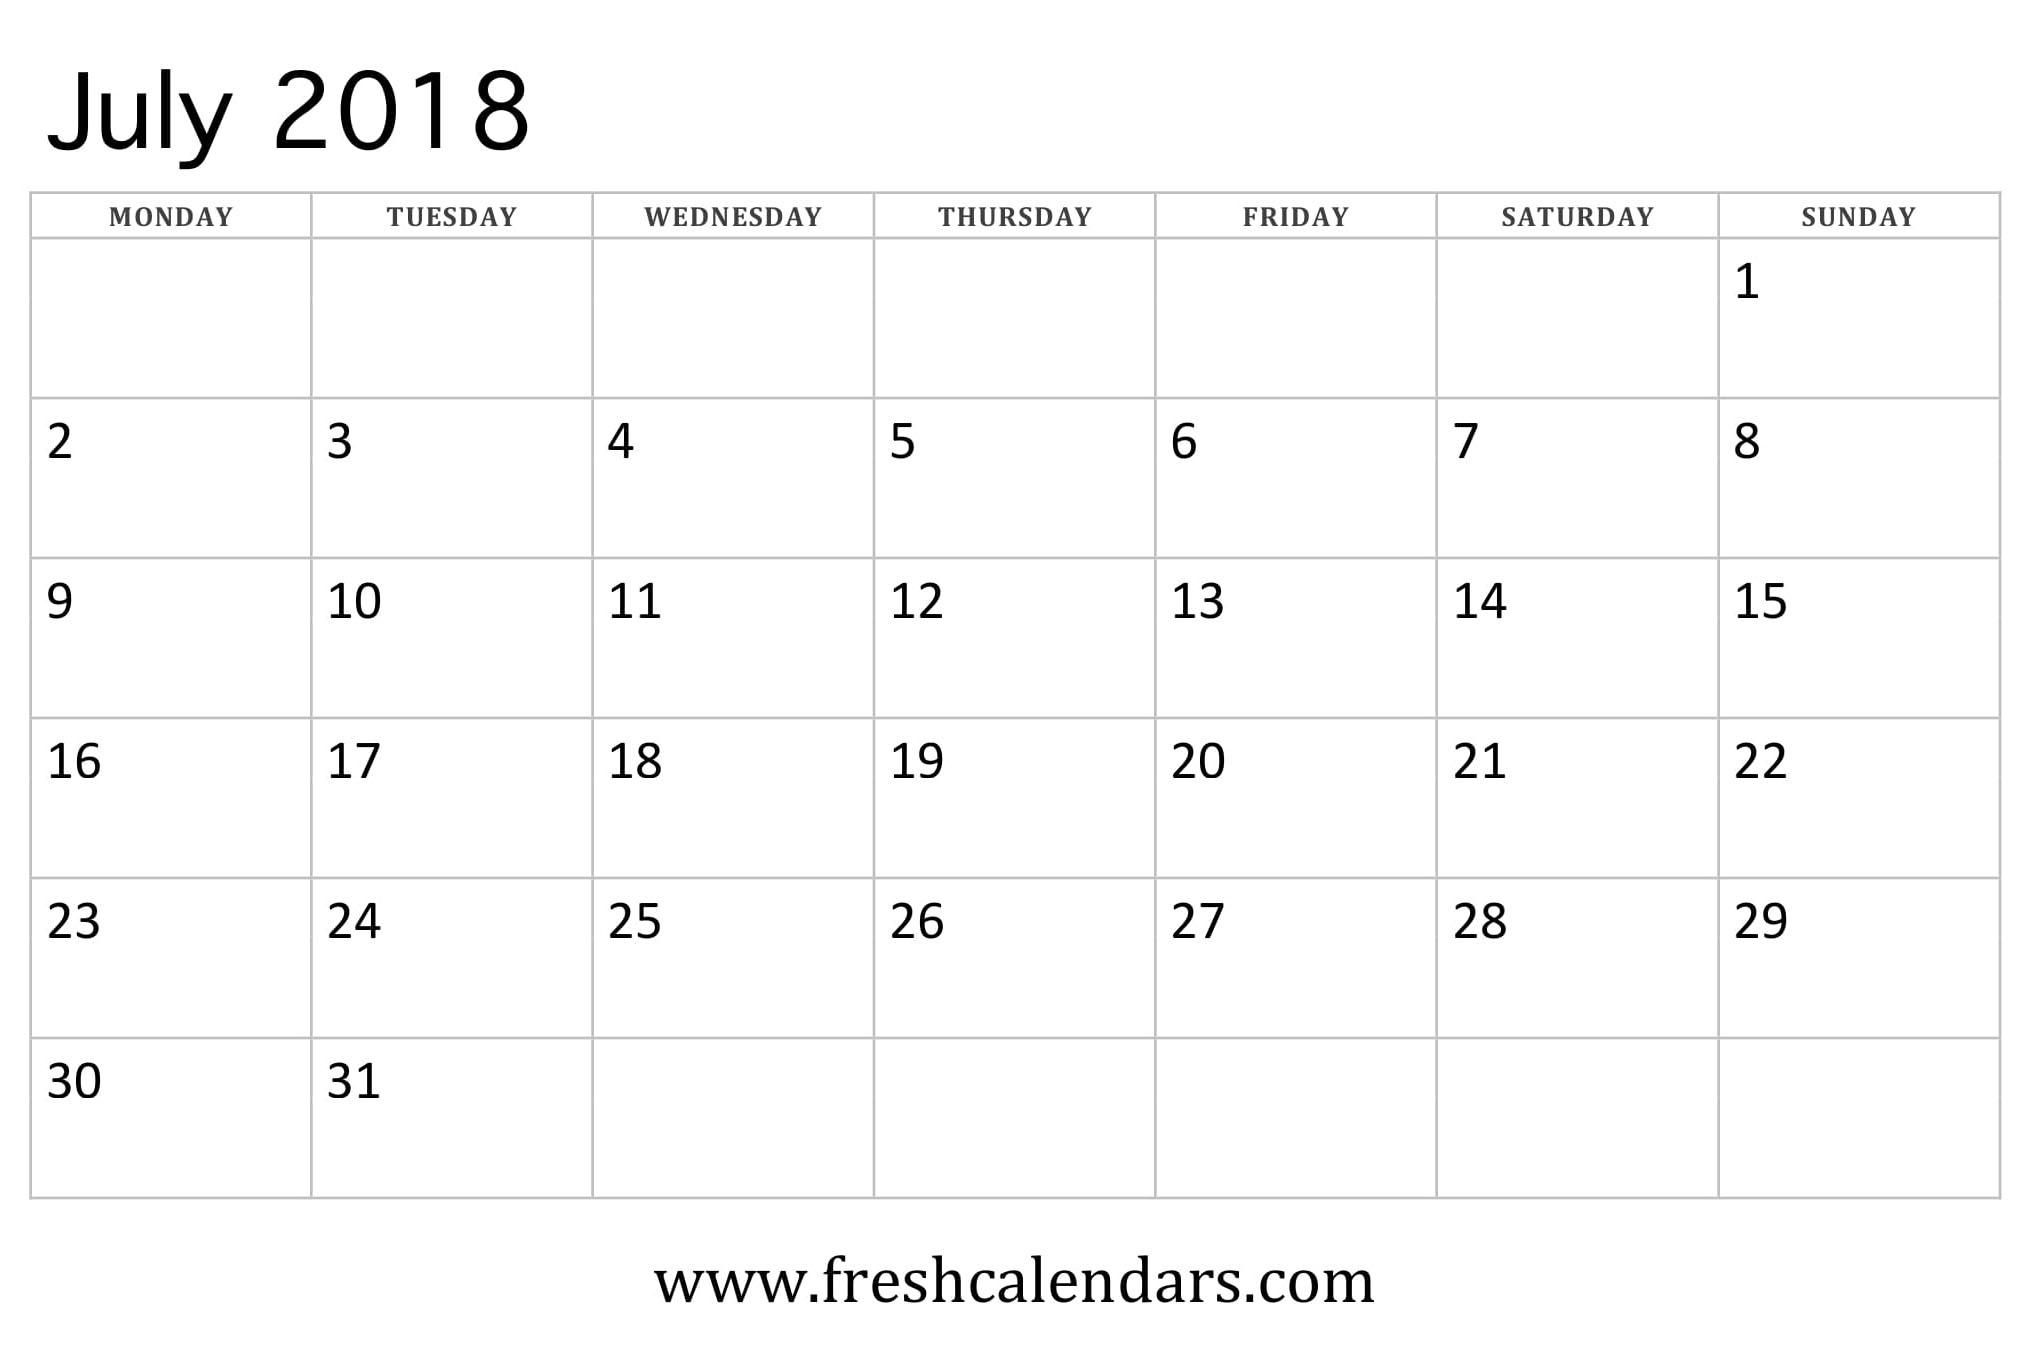 July 2018 Calendar Printable - Fresh Calendars